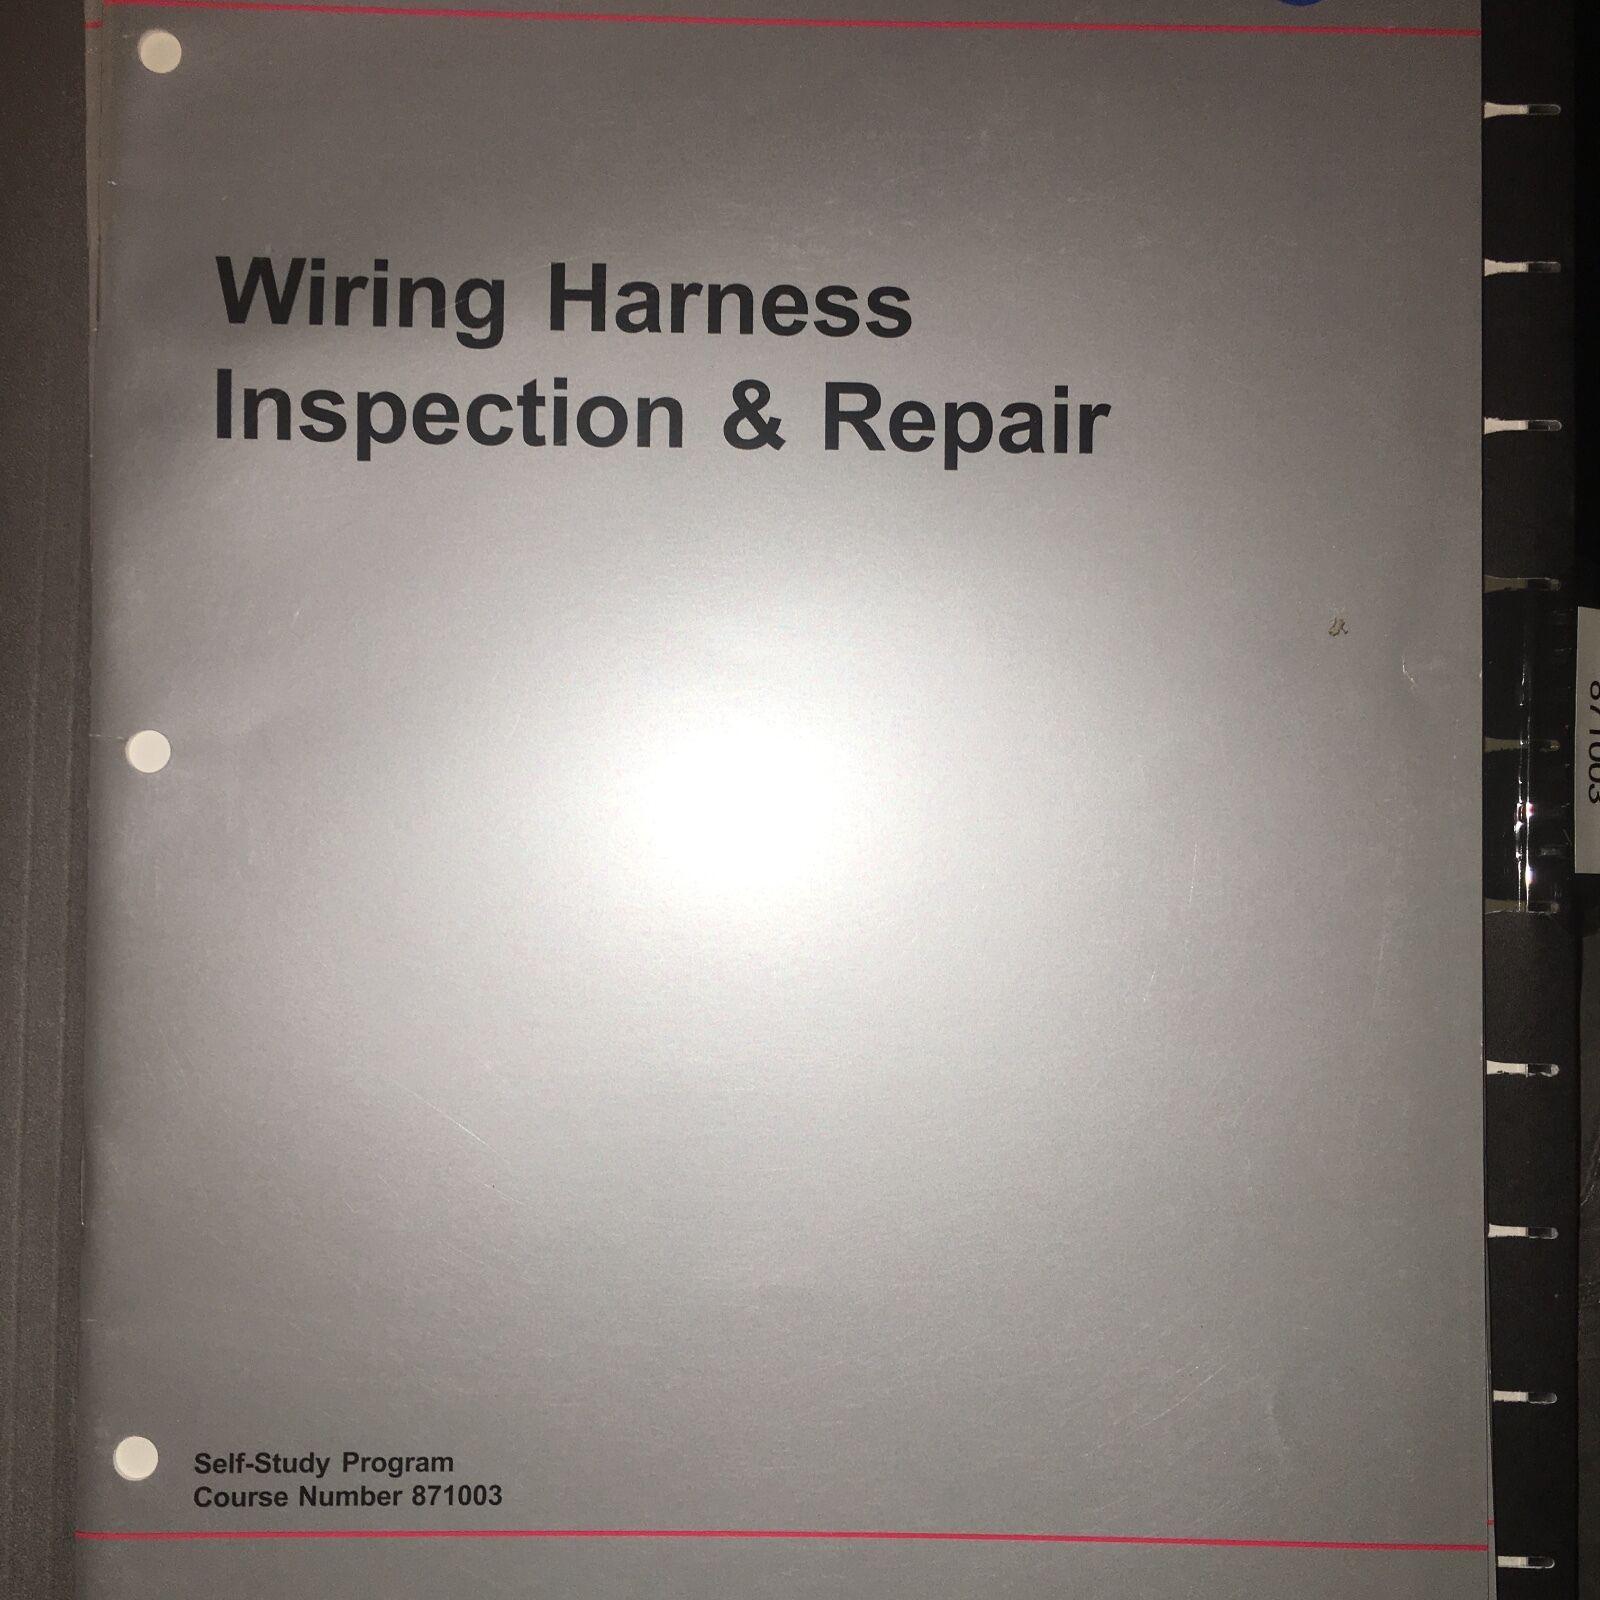 hight resolution of vw manual 871003 volkswagen wiring harness service repair training manual exam ebay